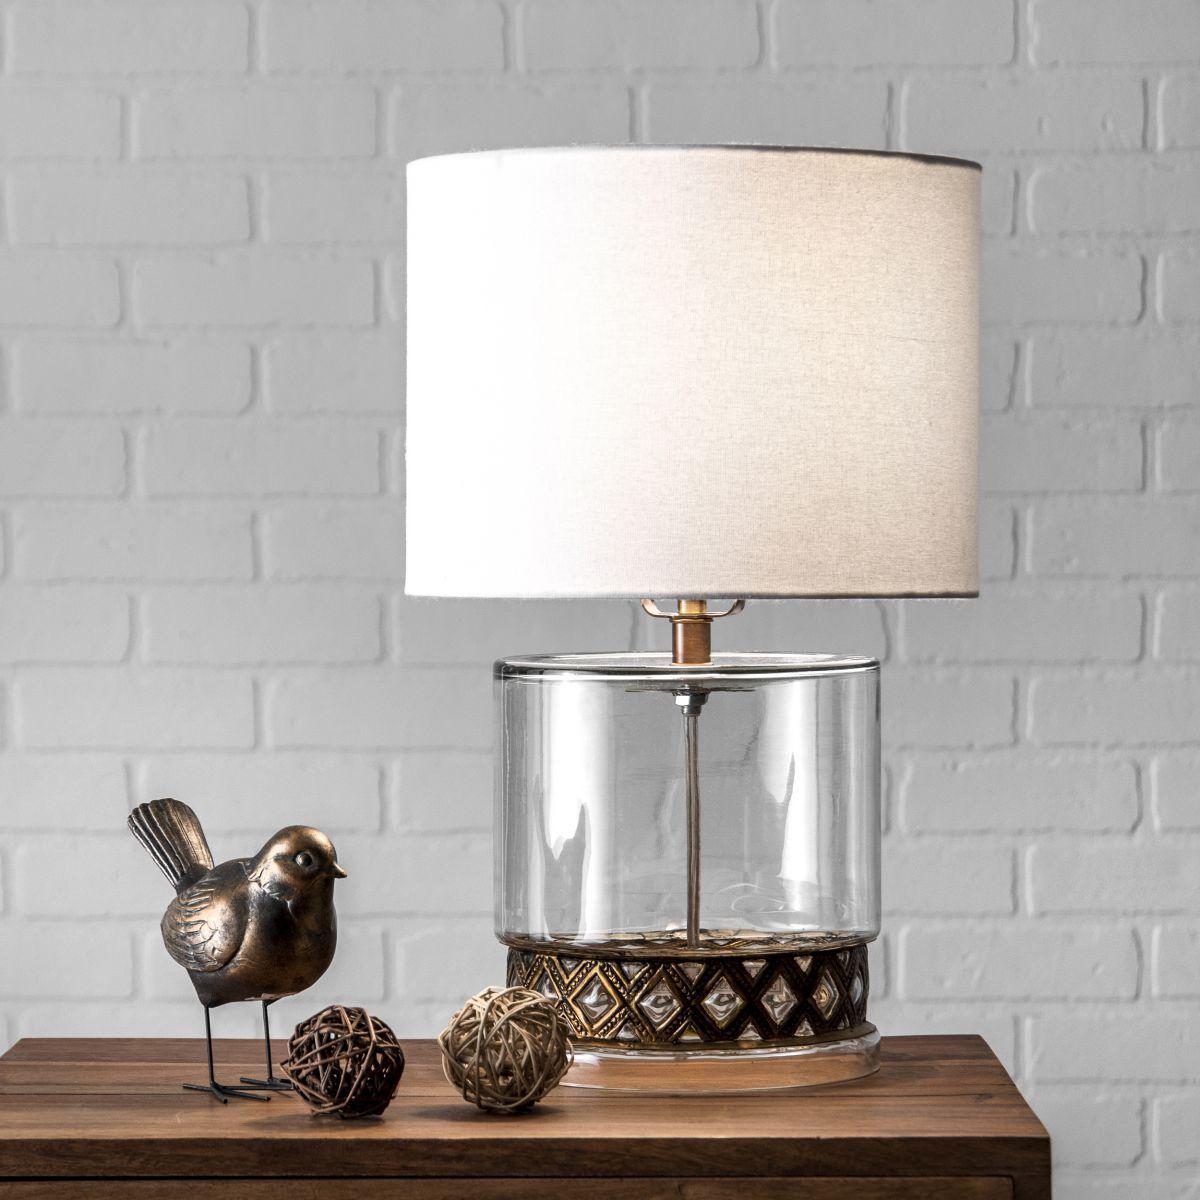 Revere 12 Inch Laurel Coronated Glass Table Lamp Clear Glass Lamp Table Lamp Glass Table Lamp Lamp